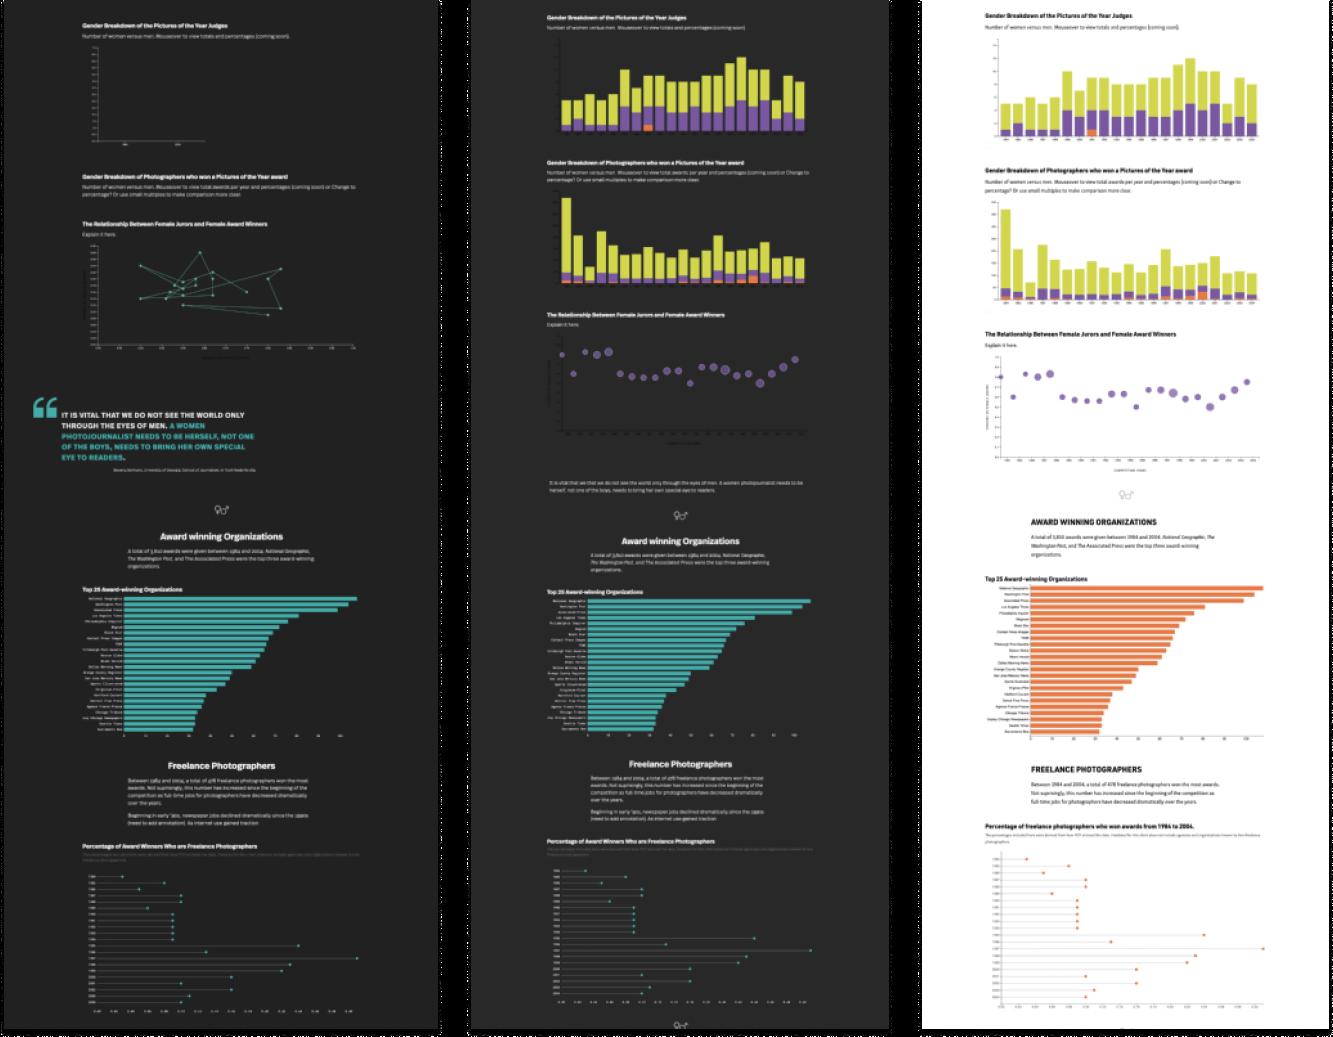 design-exploration-charts-story-colors@1x